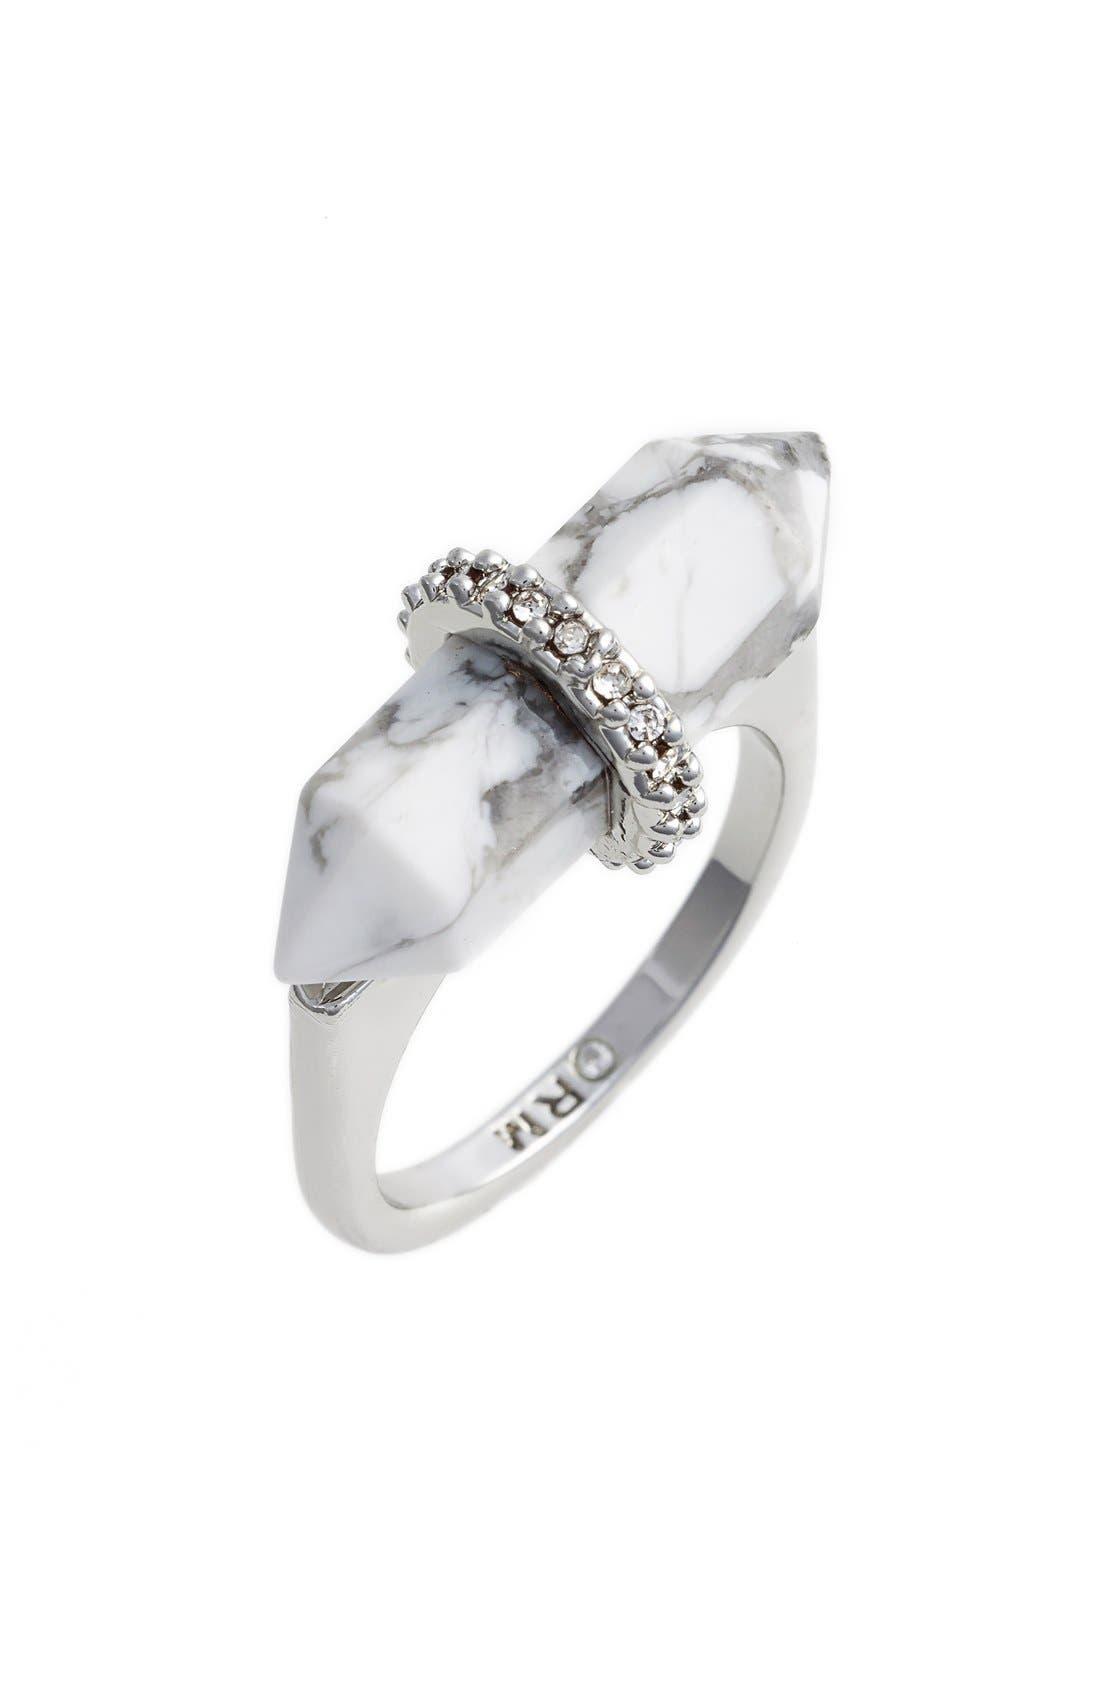 Main Image - Rebecca Minkoff Raw Crystal Ring